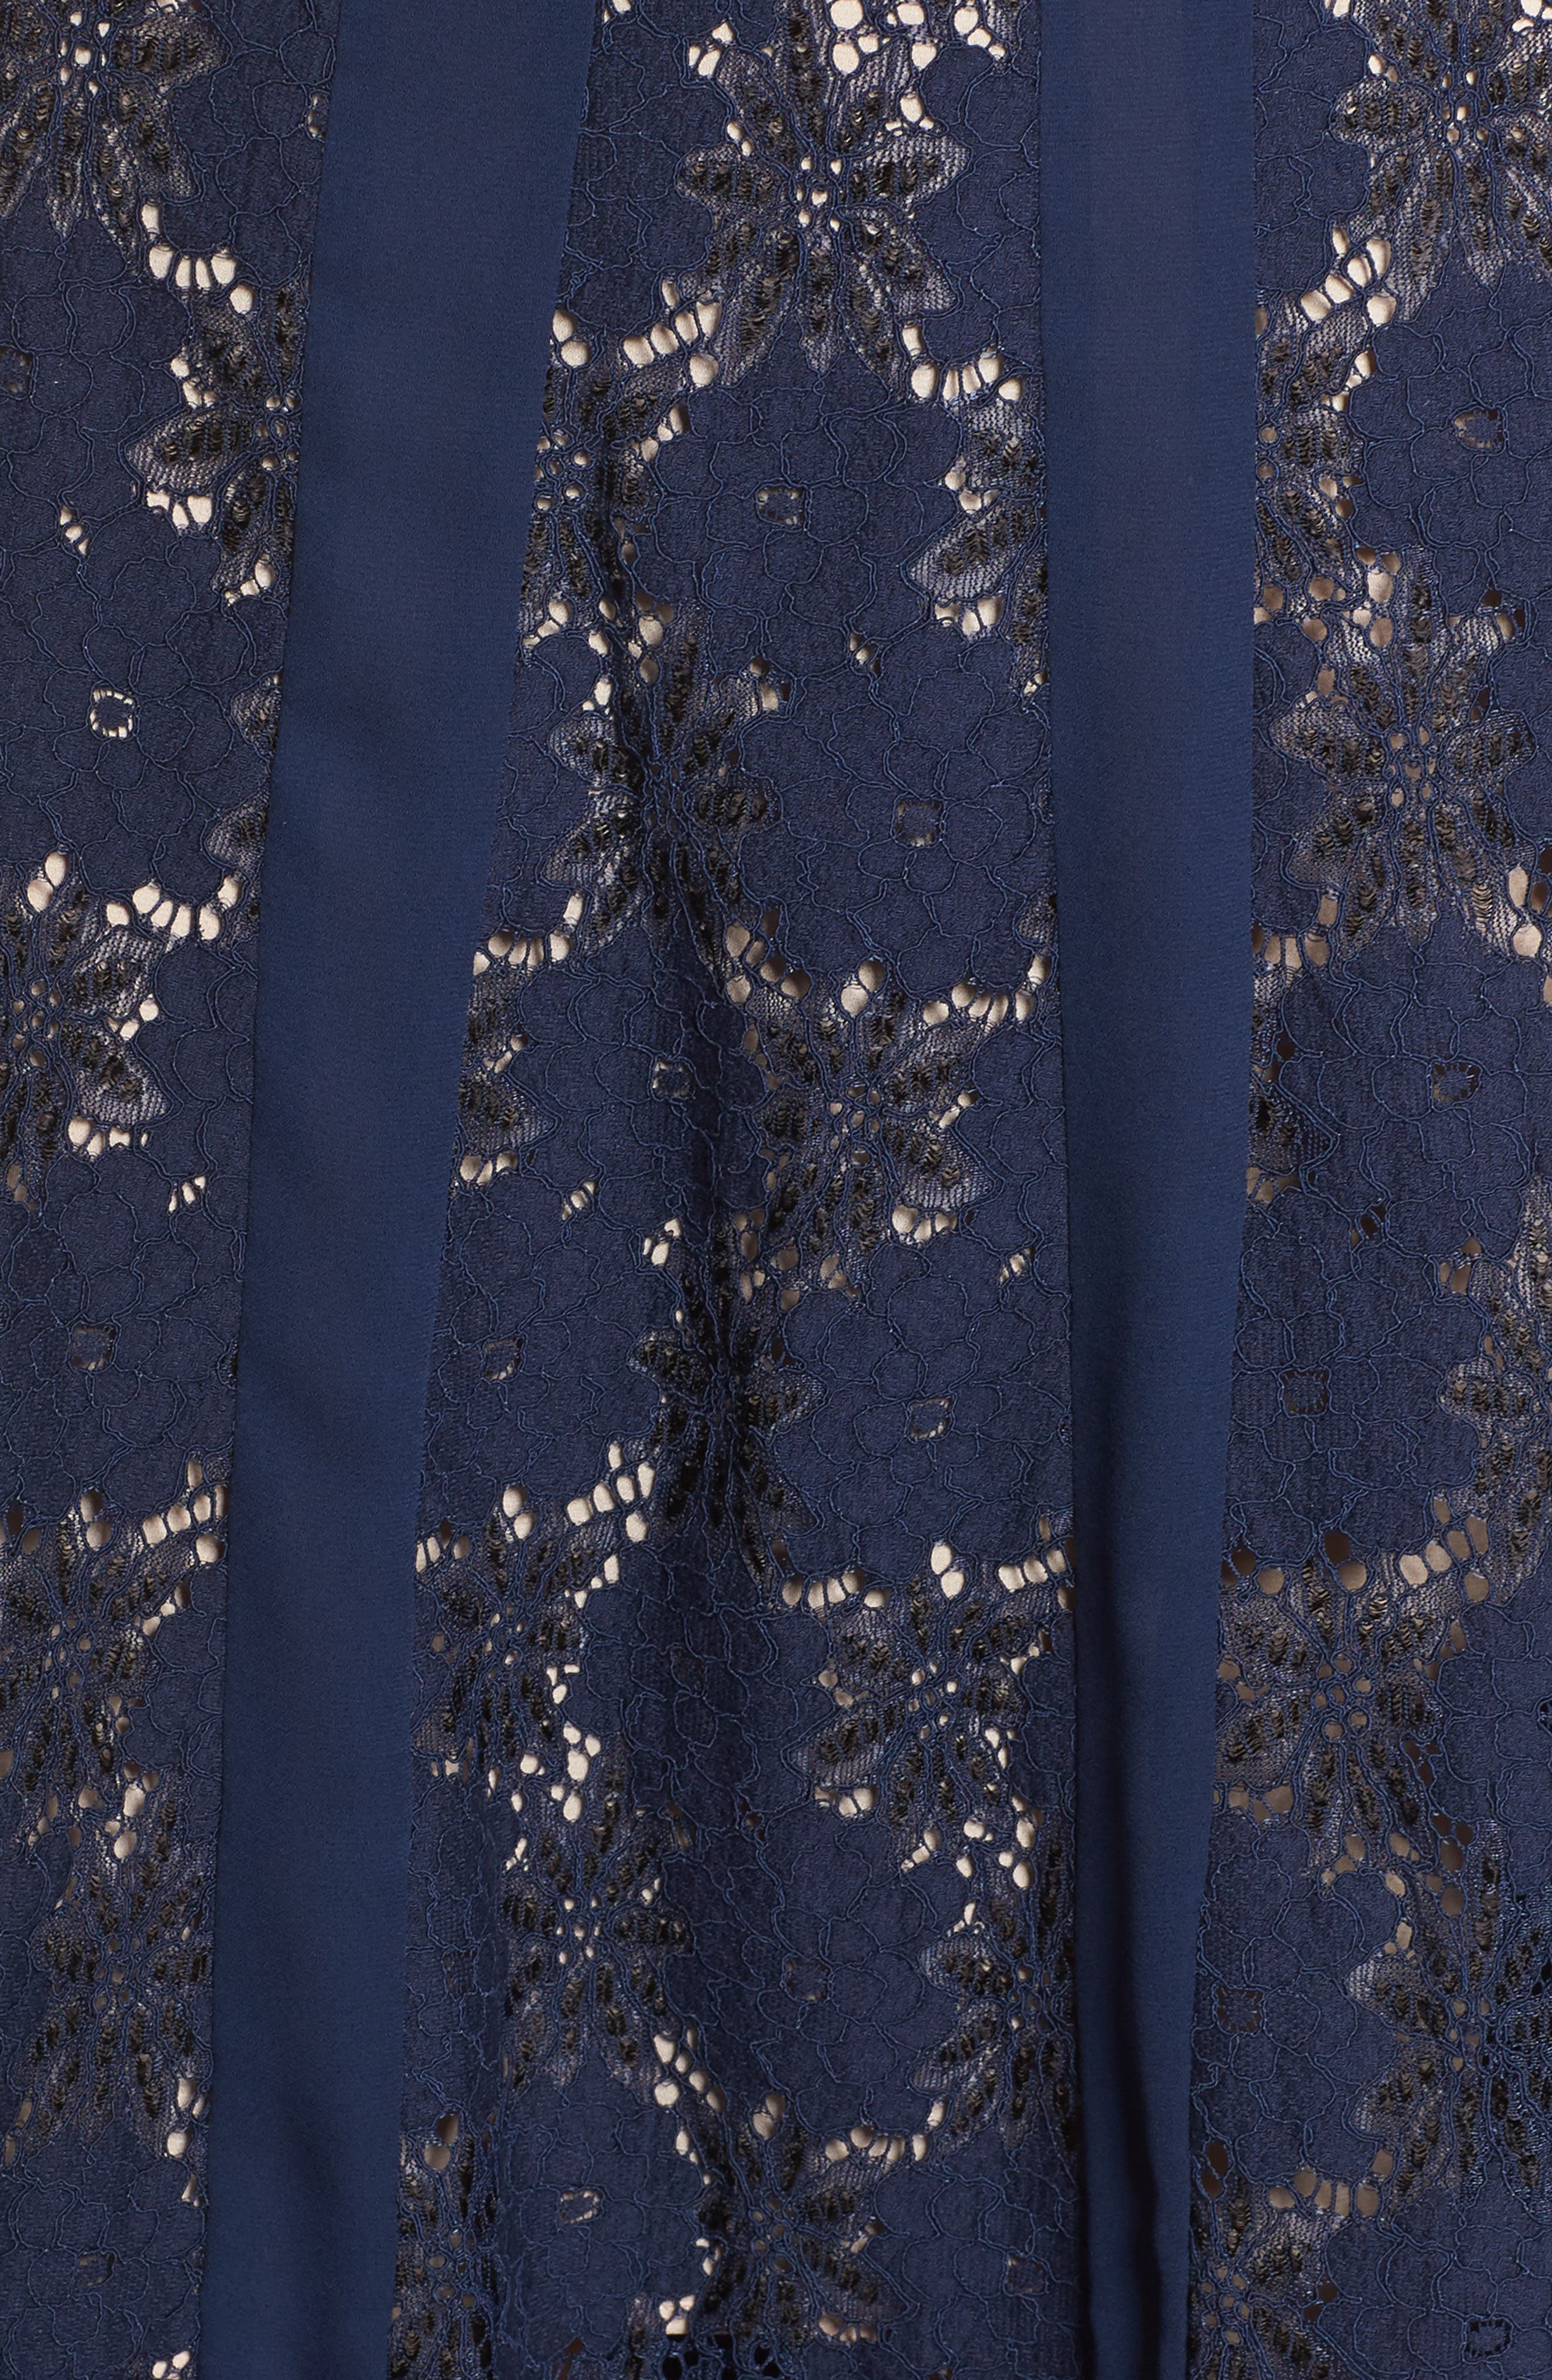 Atiqah Two-Piece Dress,                             Alternate thumbnail 5, color,                             414